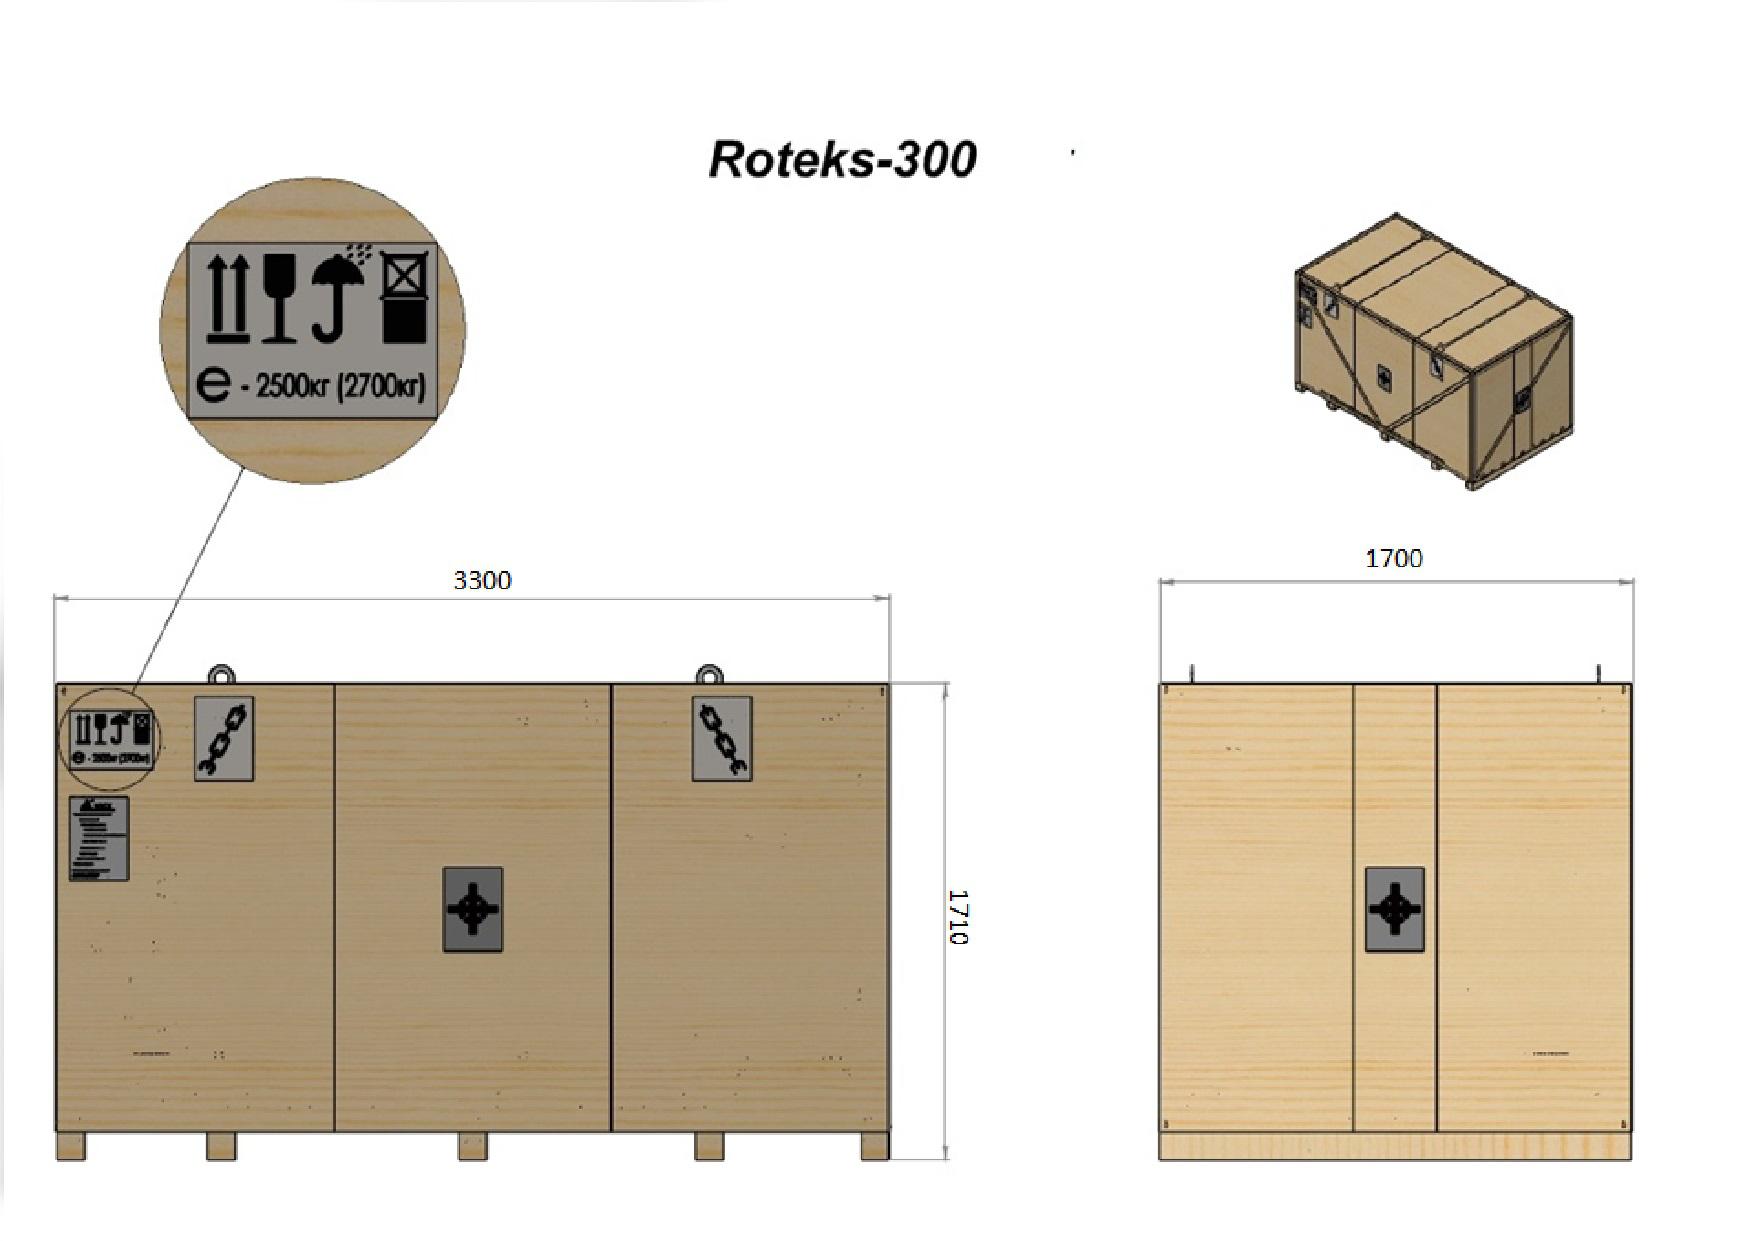 Ротекс-300